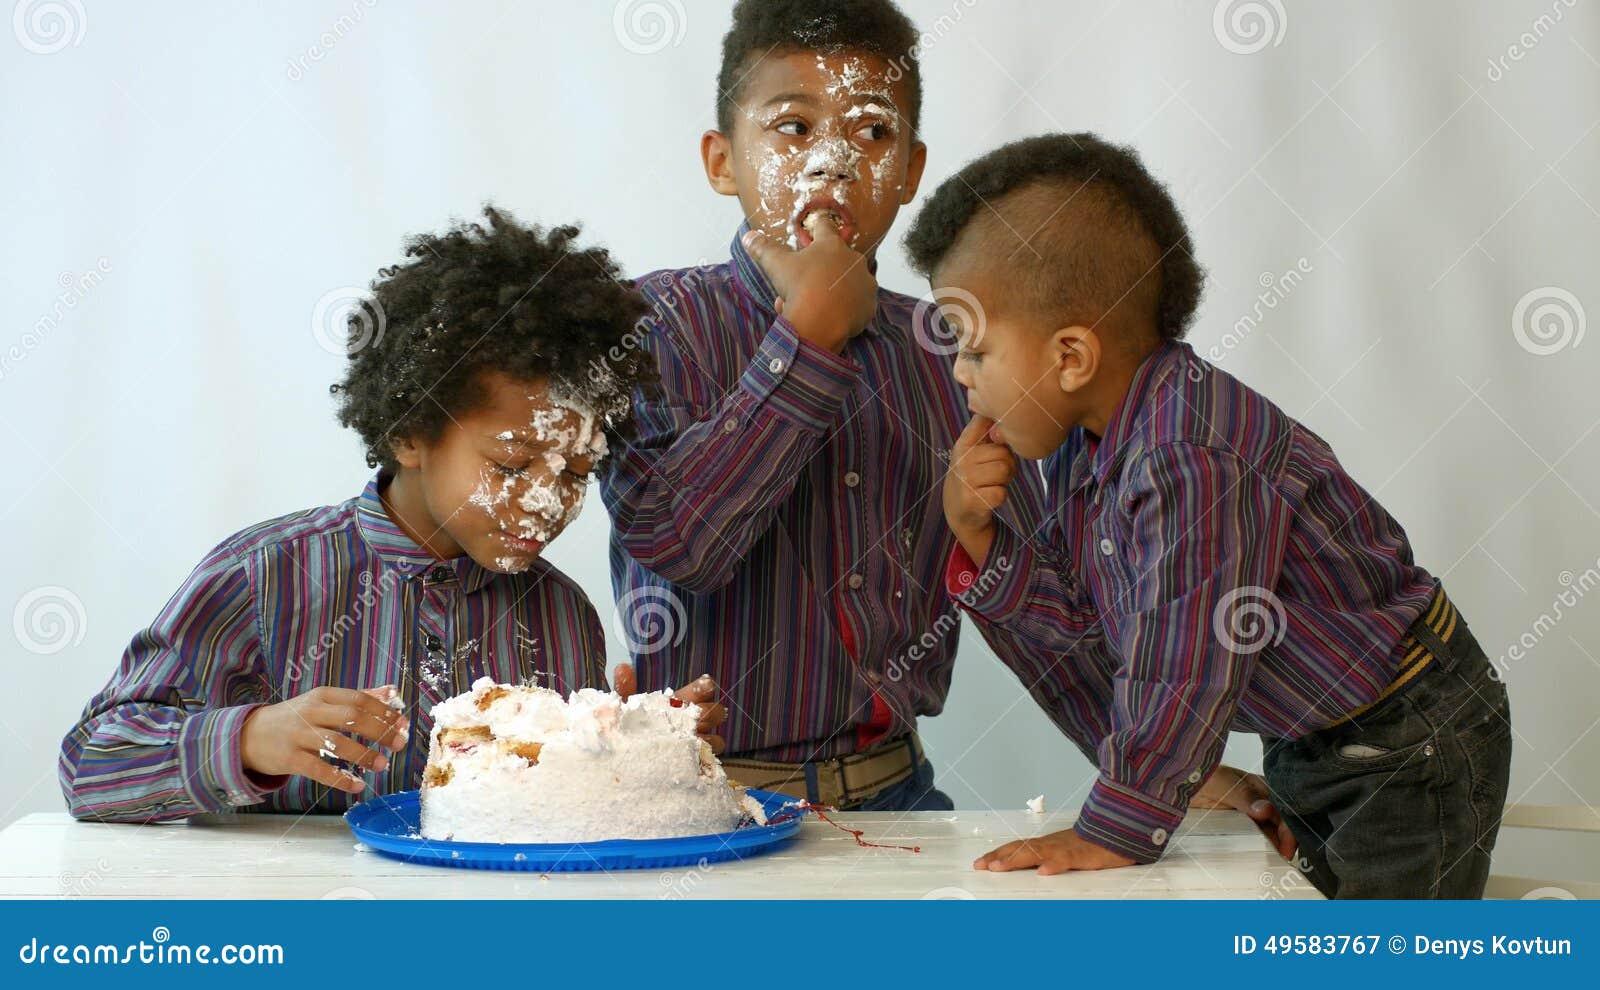 cake-eat-lick-black